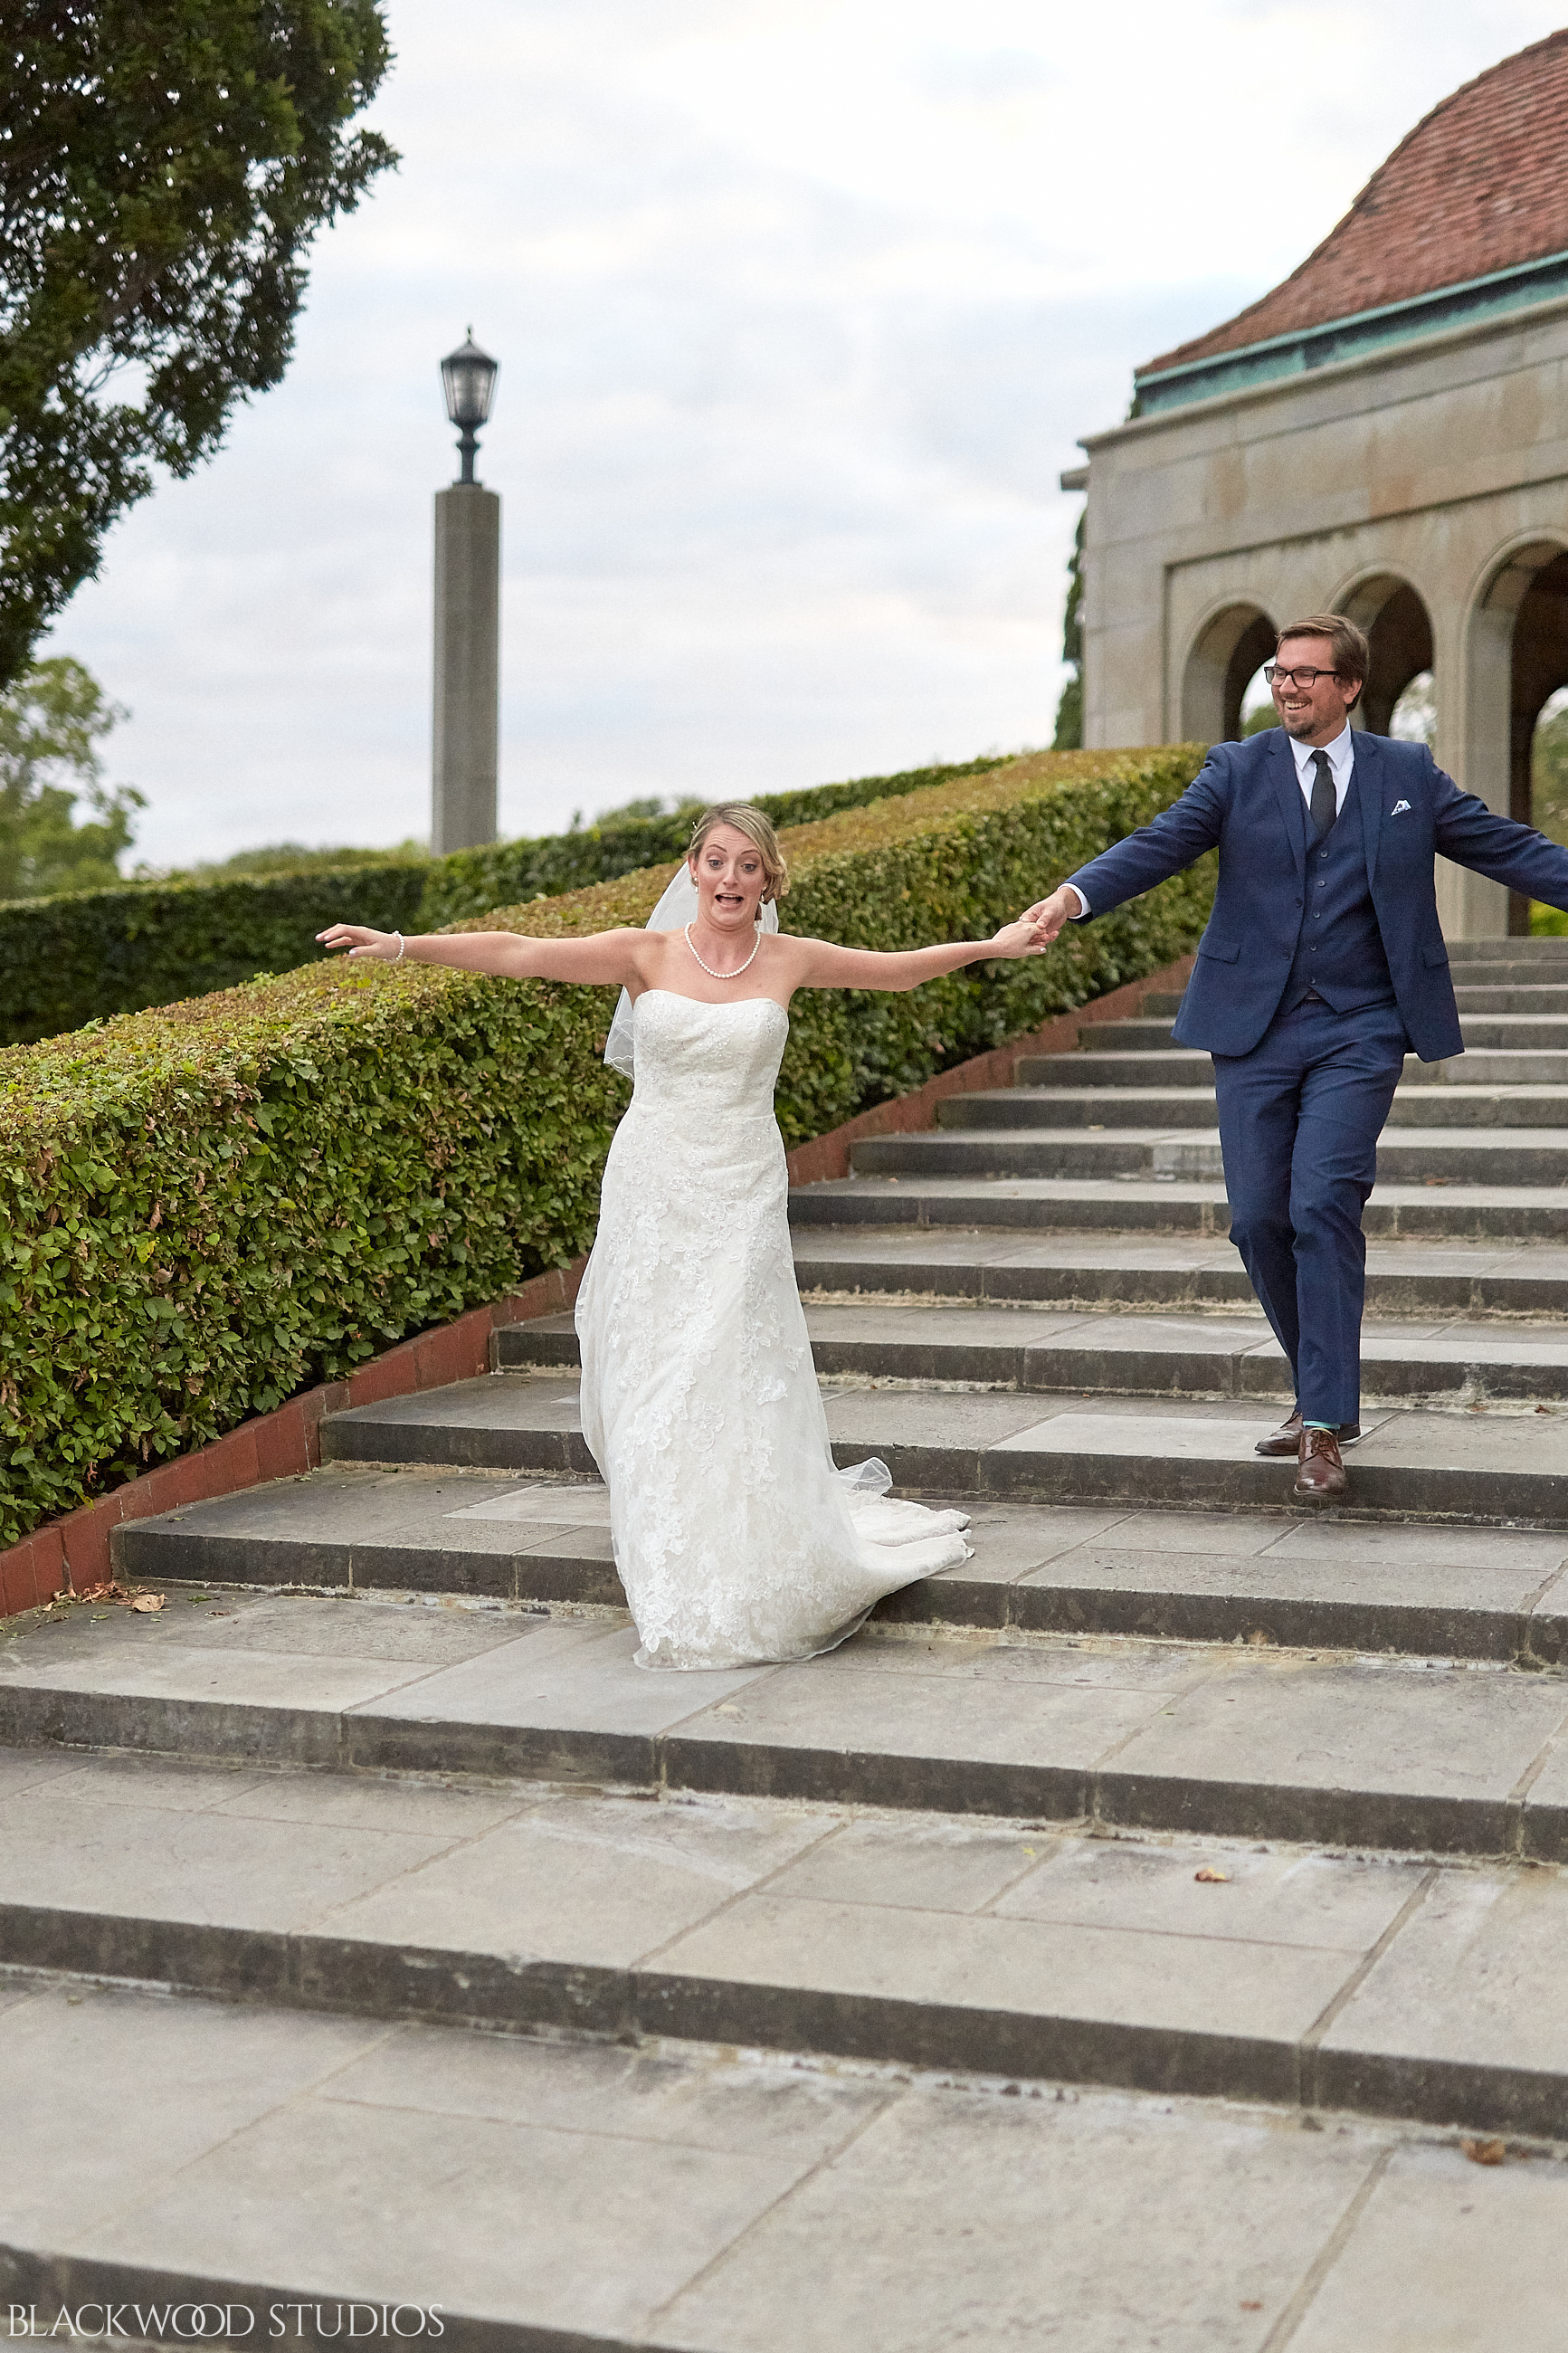 Blackwood-Studios-Wedding-Photography-20170928-183714-Marek-Katie-Michalek-Oakes-Garden-Theatre-Niagara-Falls-Ontario-Canada.jpg